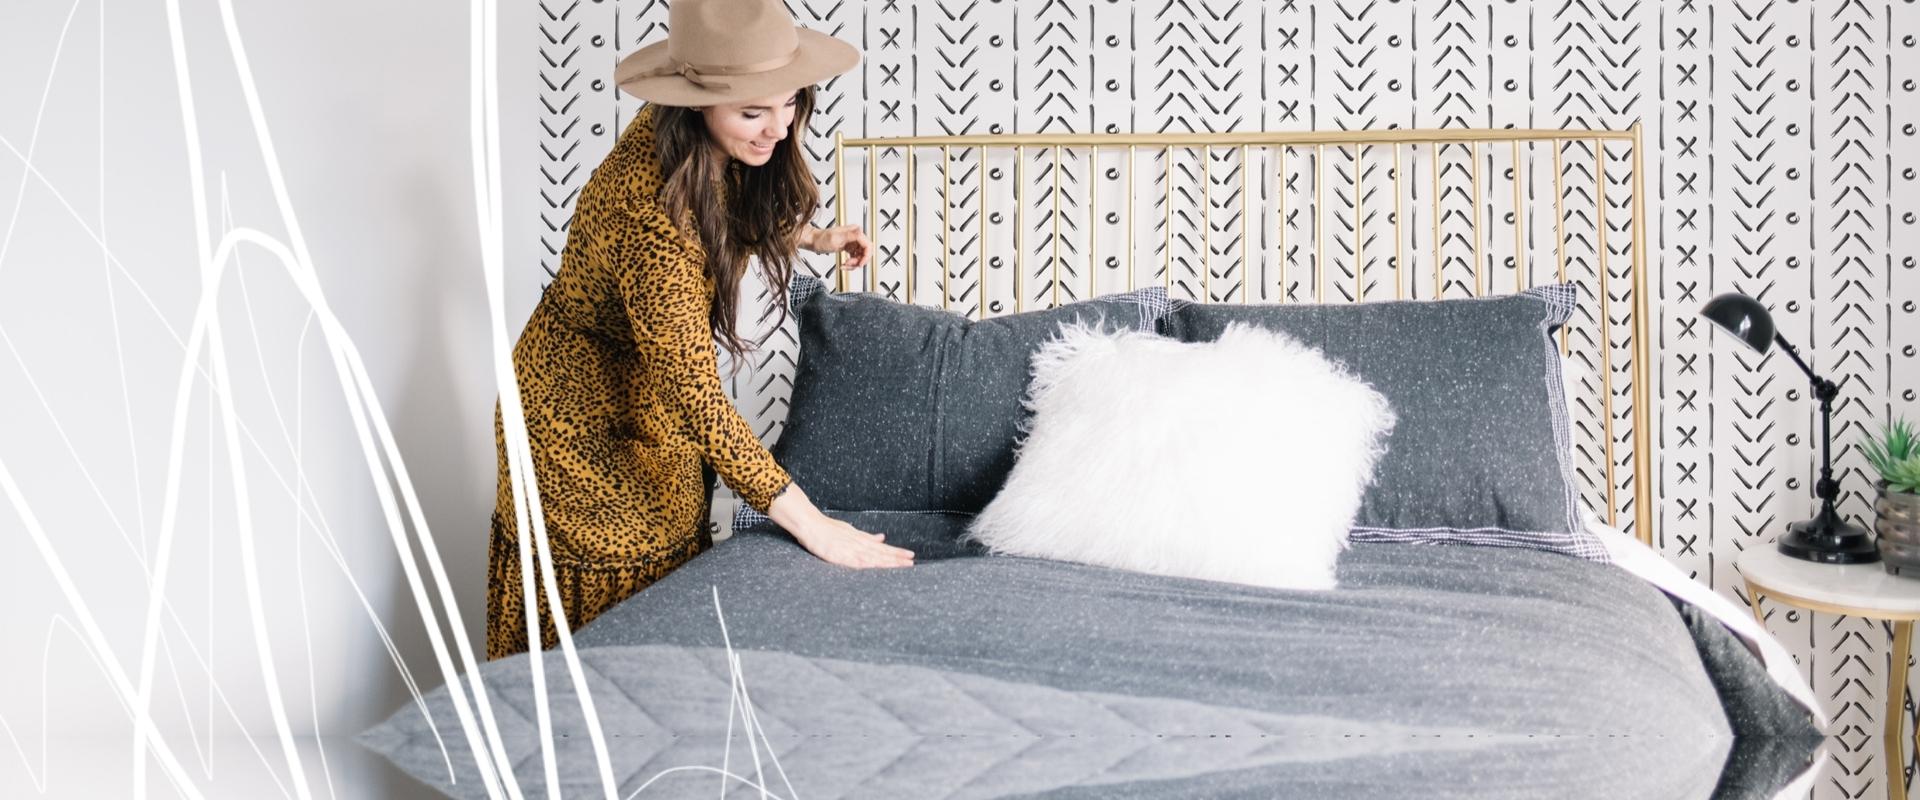 Hello Sticky - Shop - Peel & Stick Removable Wallpaper - All Wallpaper Header